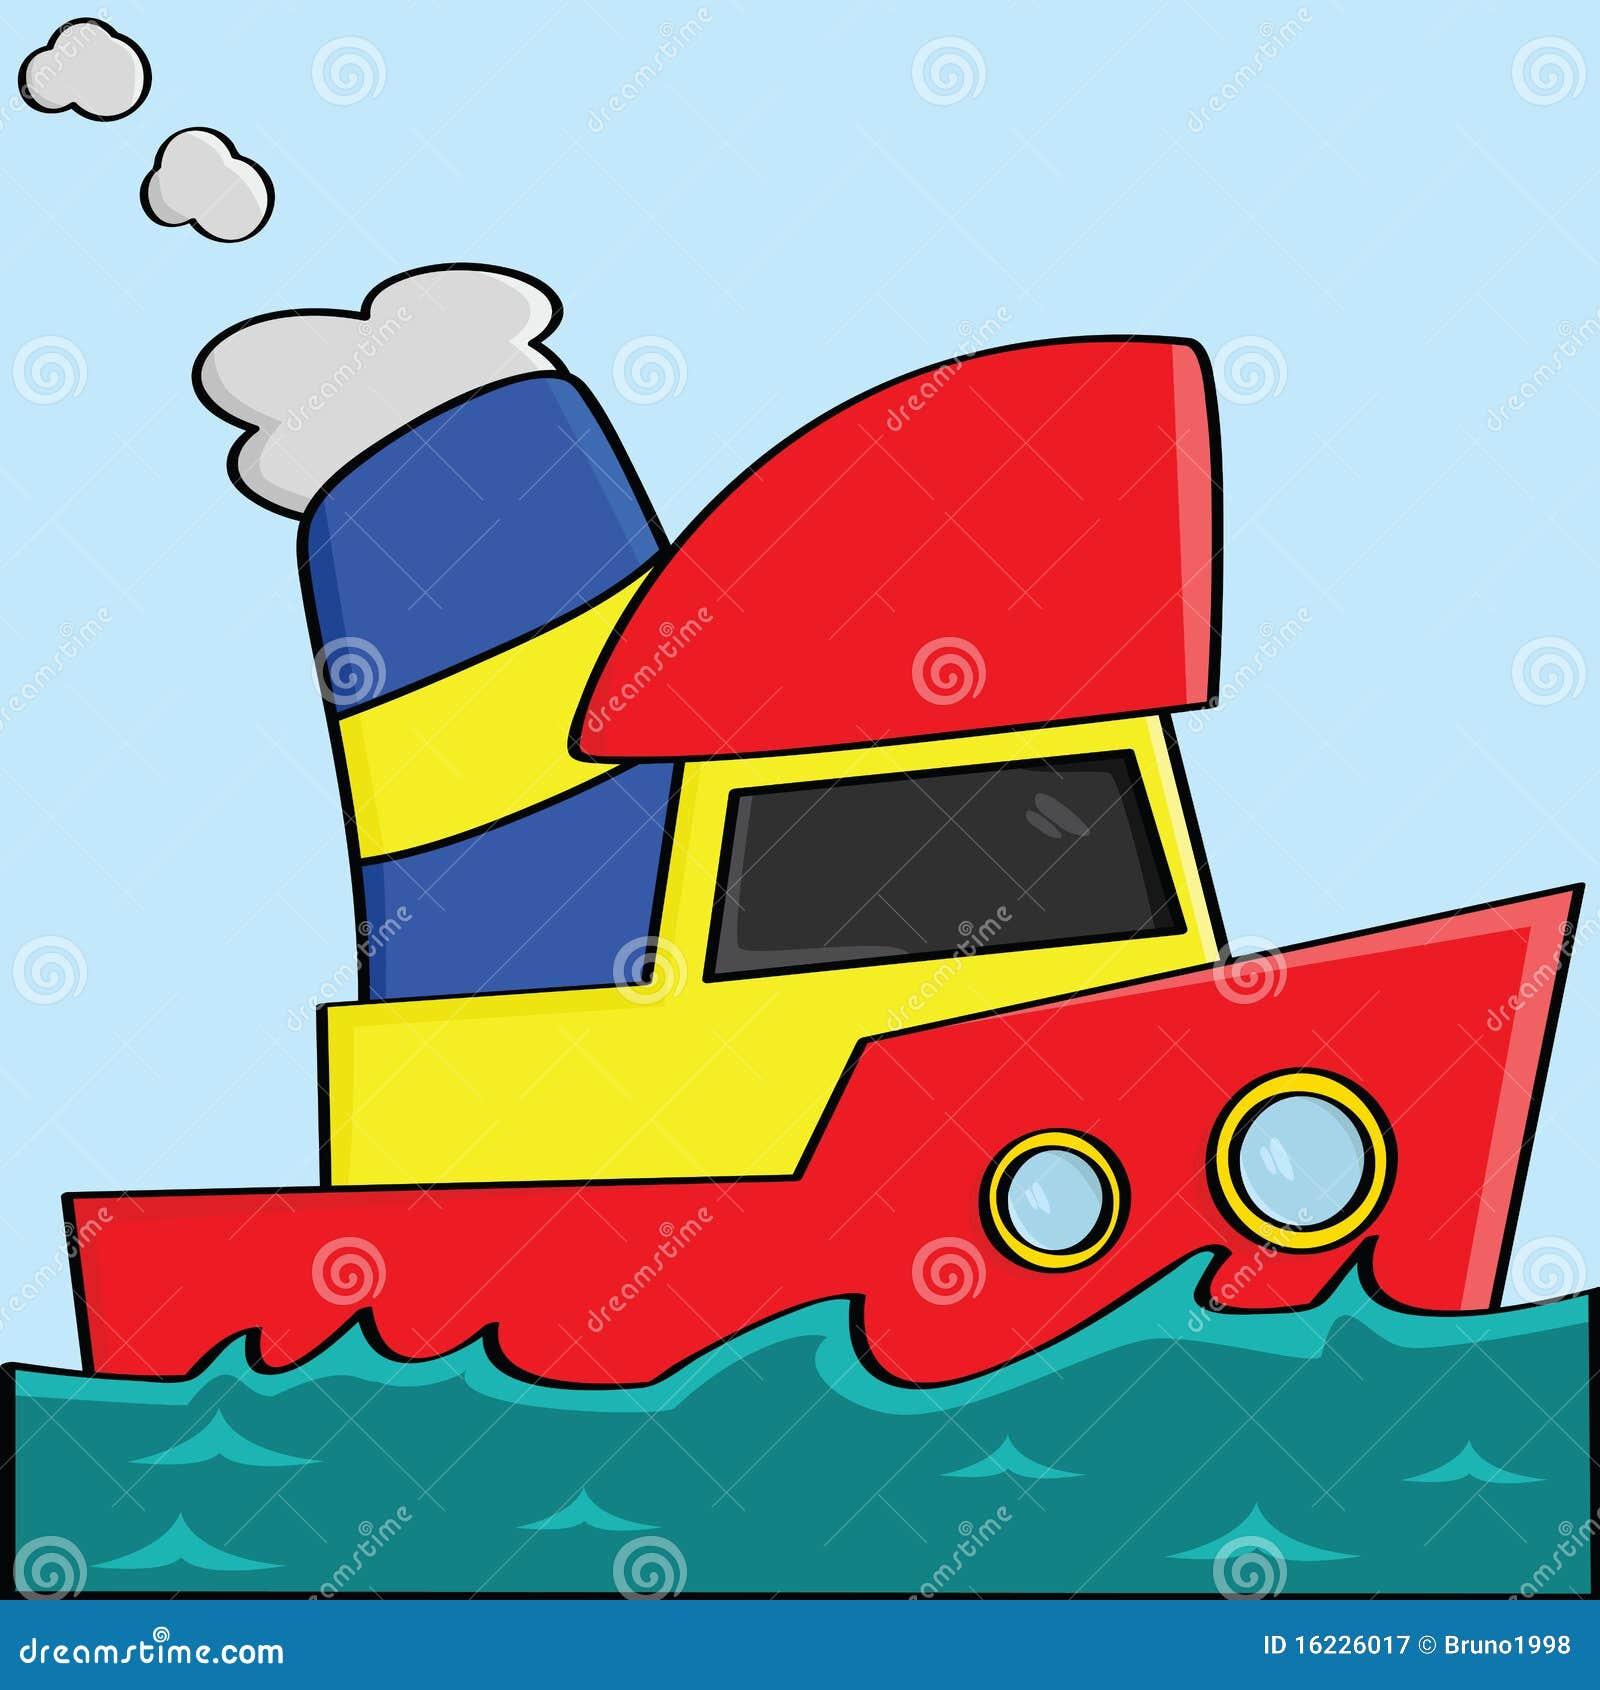 Cartoon Boat Royalty Free Stock Photography - Image: 16226017